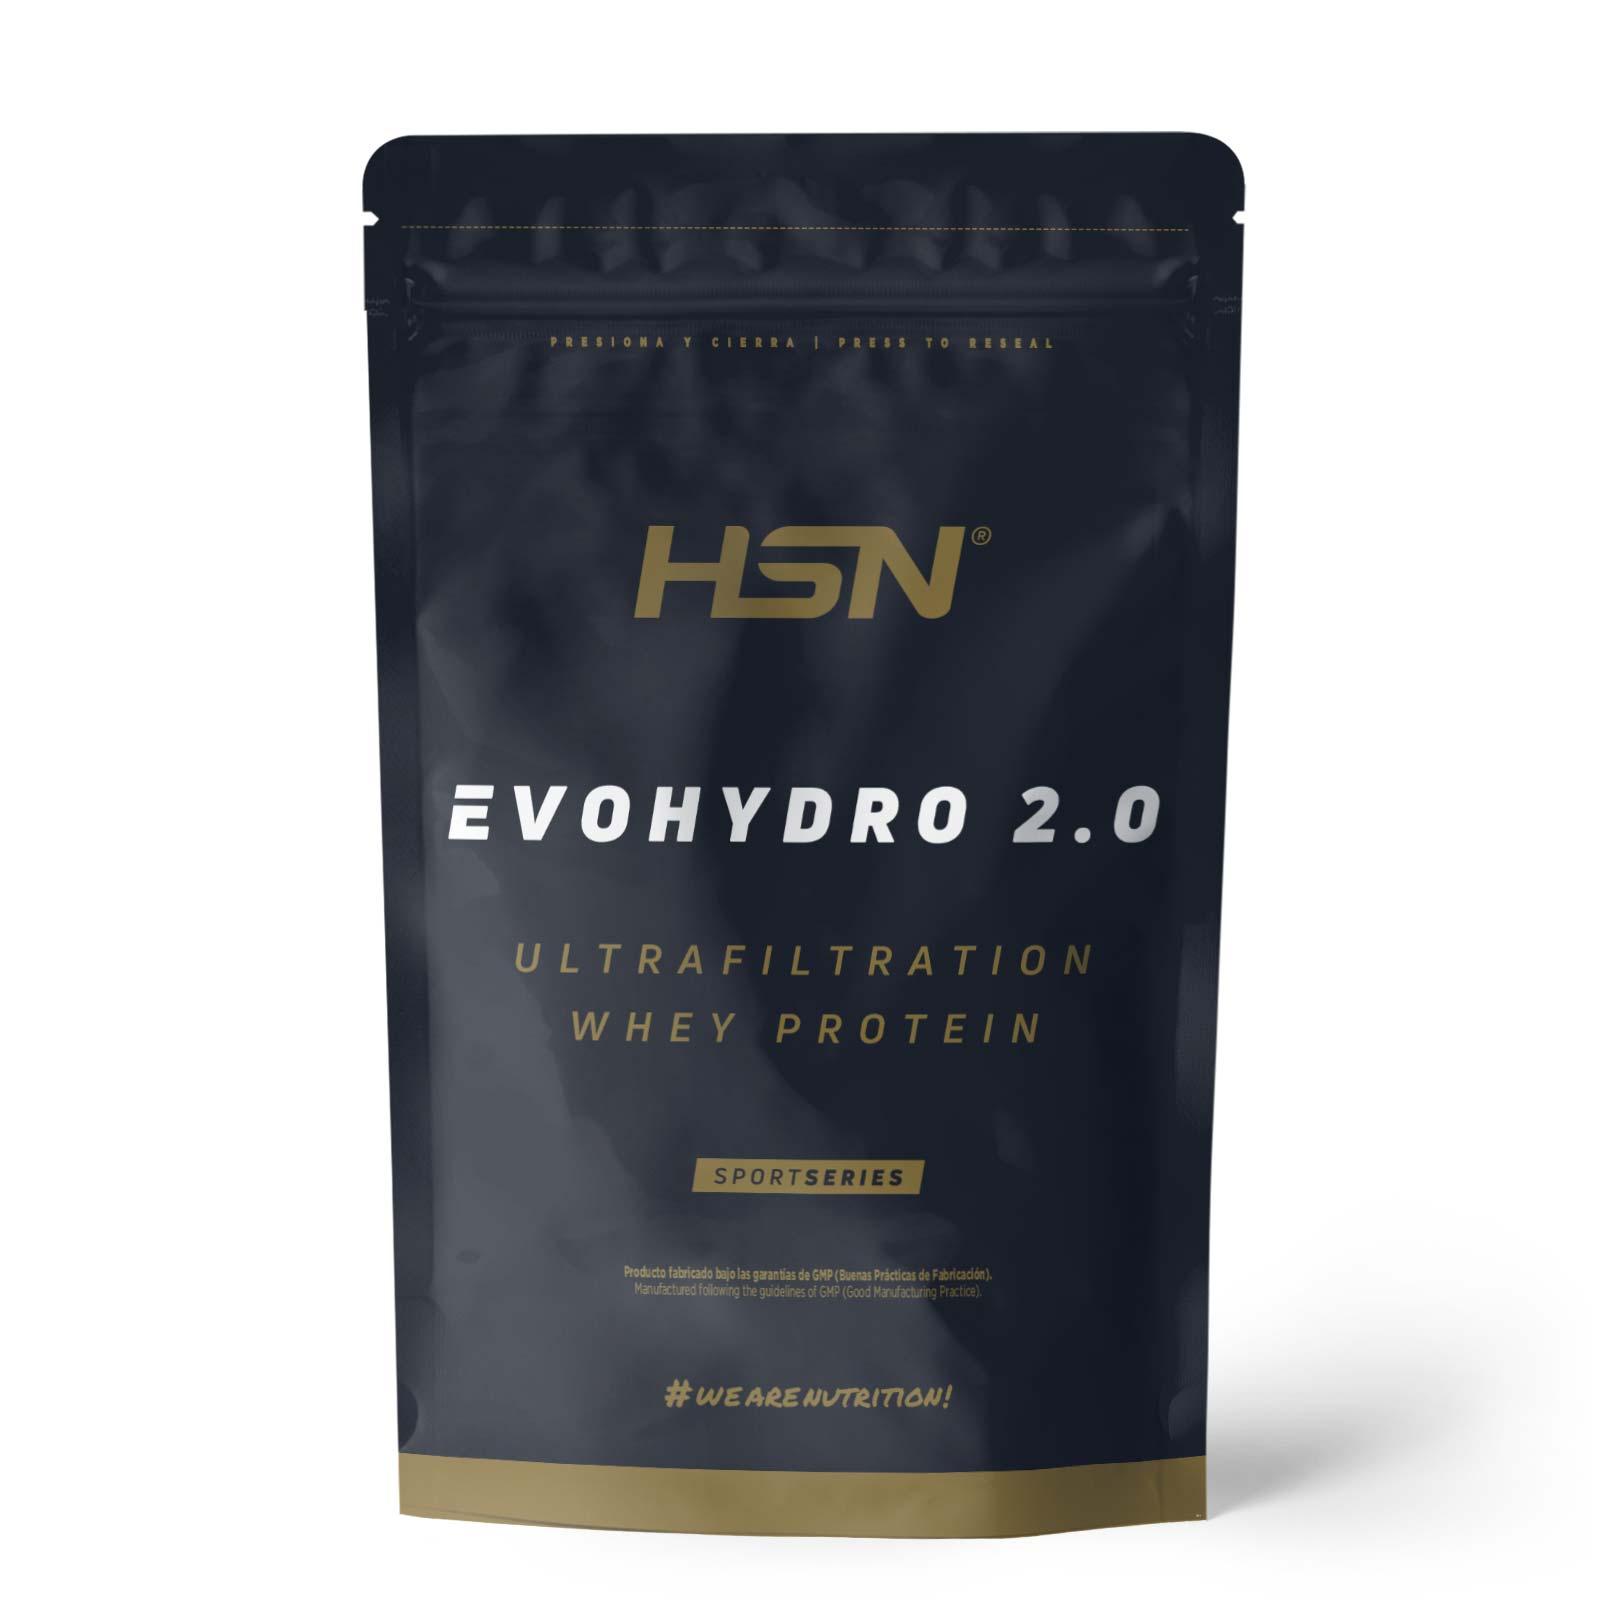 Evohydro 2.0 Hydro Whey